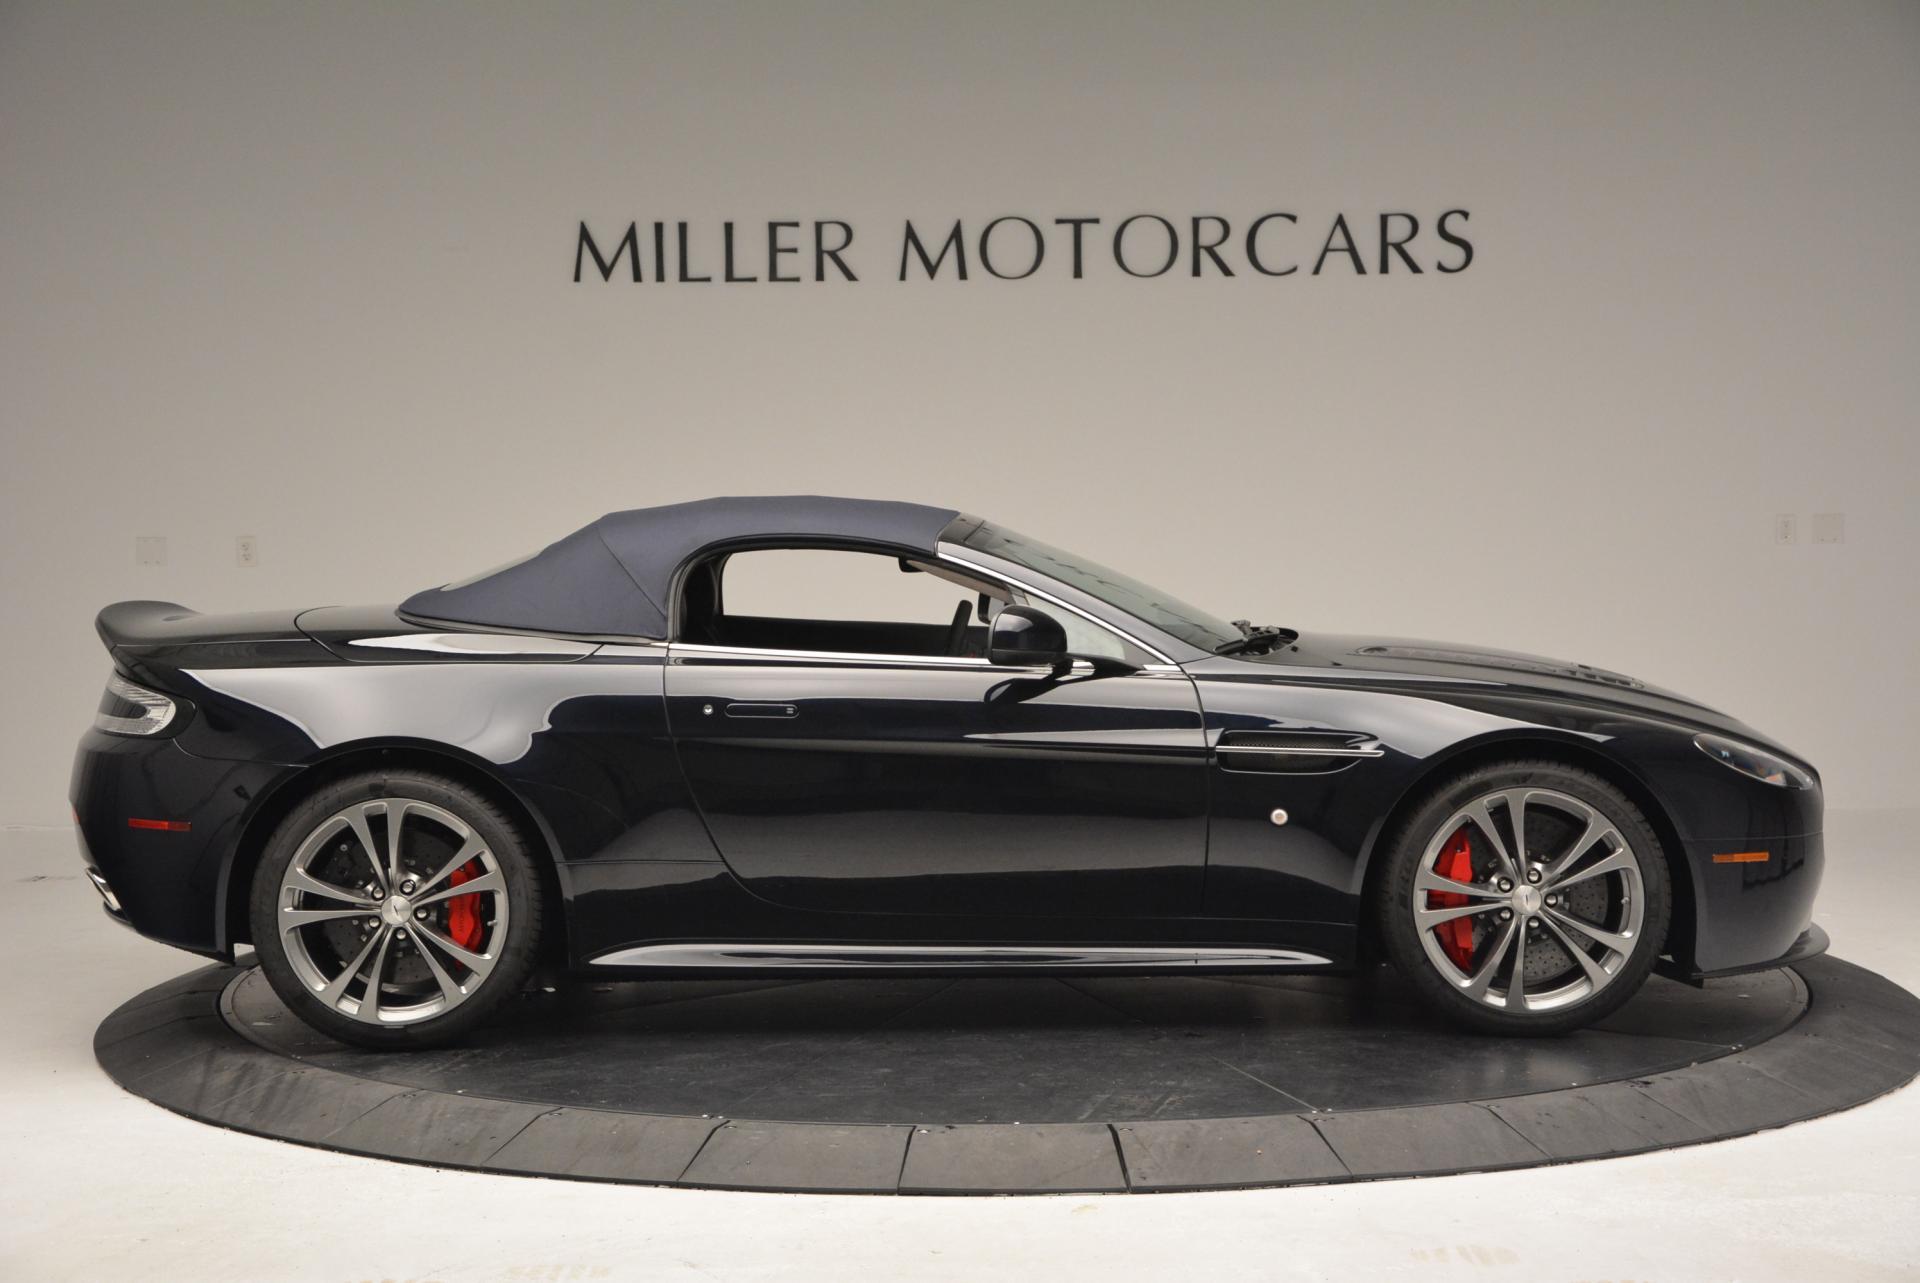 Used 2016 Aston Martin V12 Vantage S Convertible For Sale In Greenwich, CT. Alfa Romeo of Greenwich, 7579 89_p16